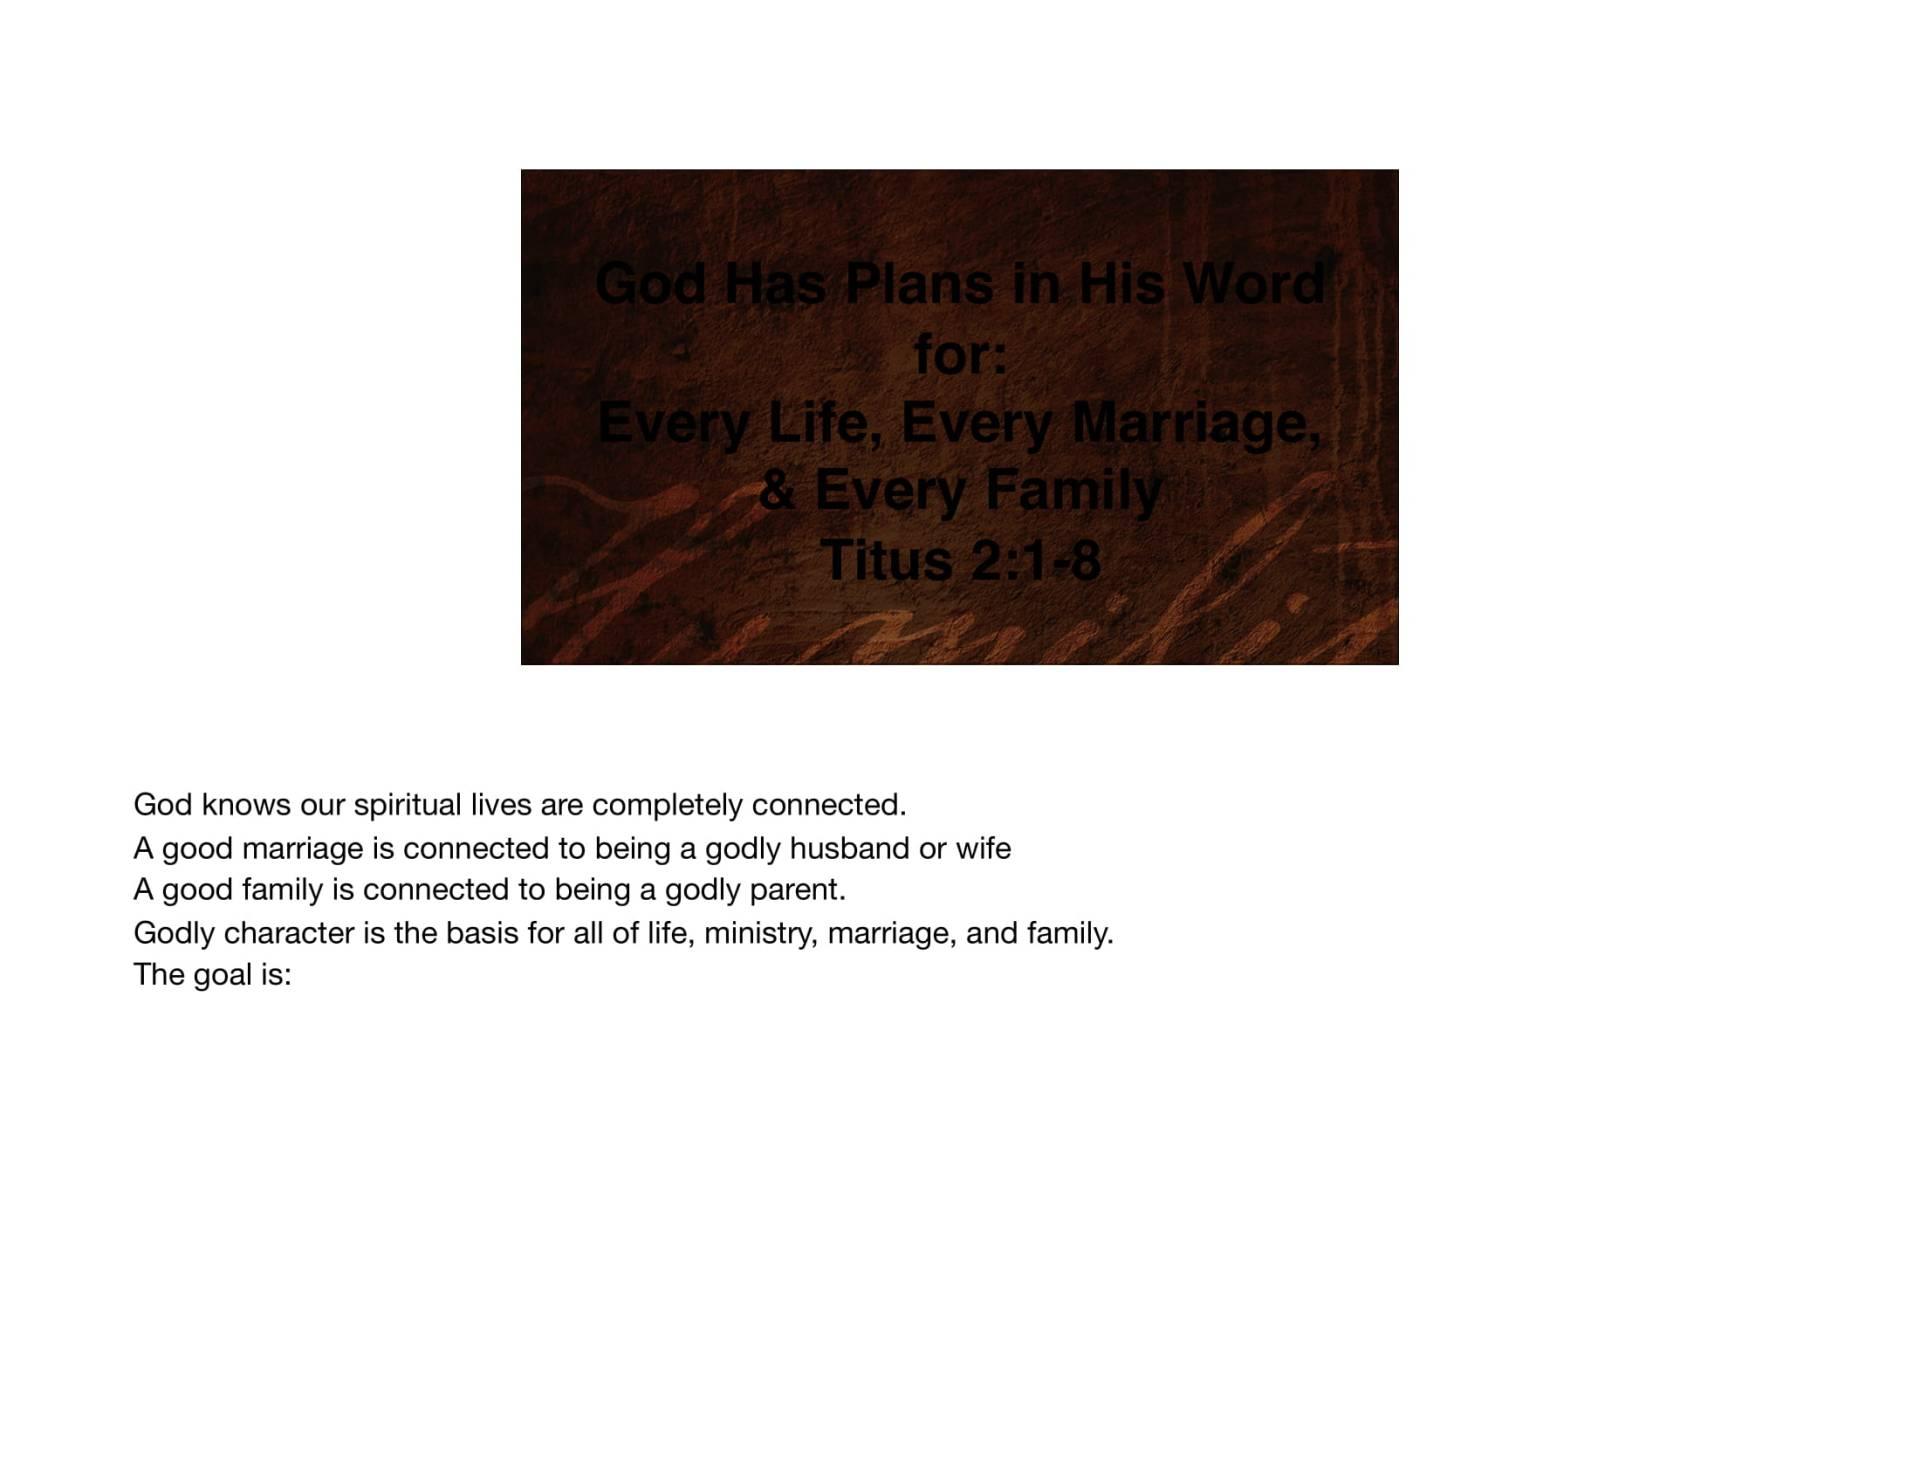 LGI-04 - Caution Men - Spiritual Maturity Is Not Automatic-07